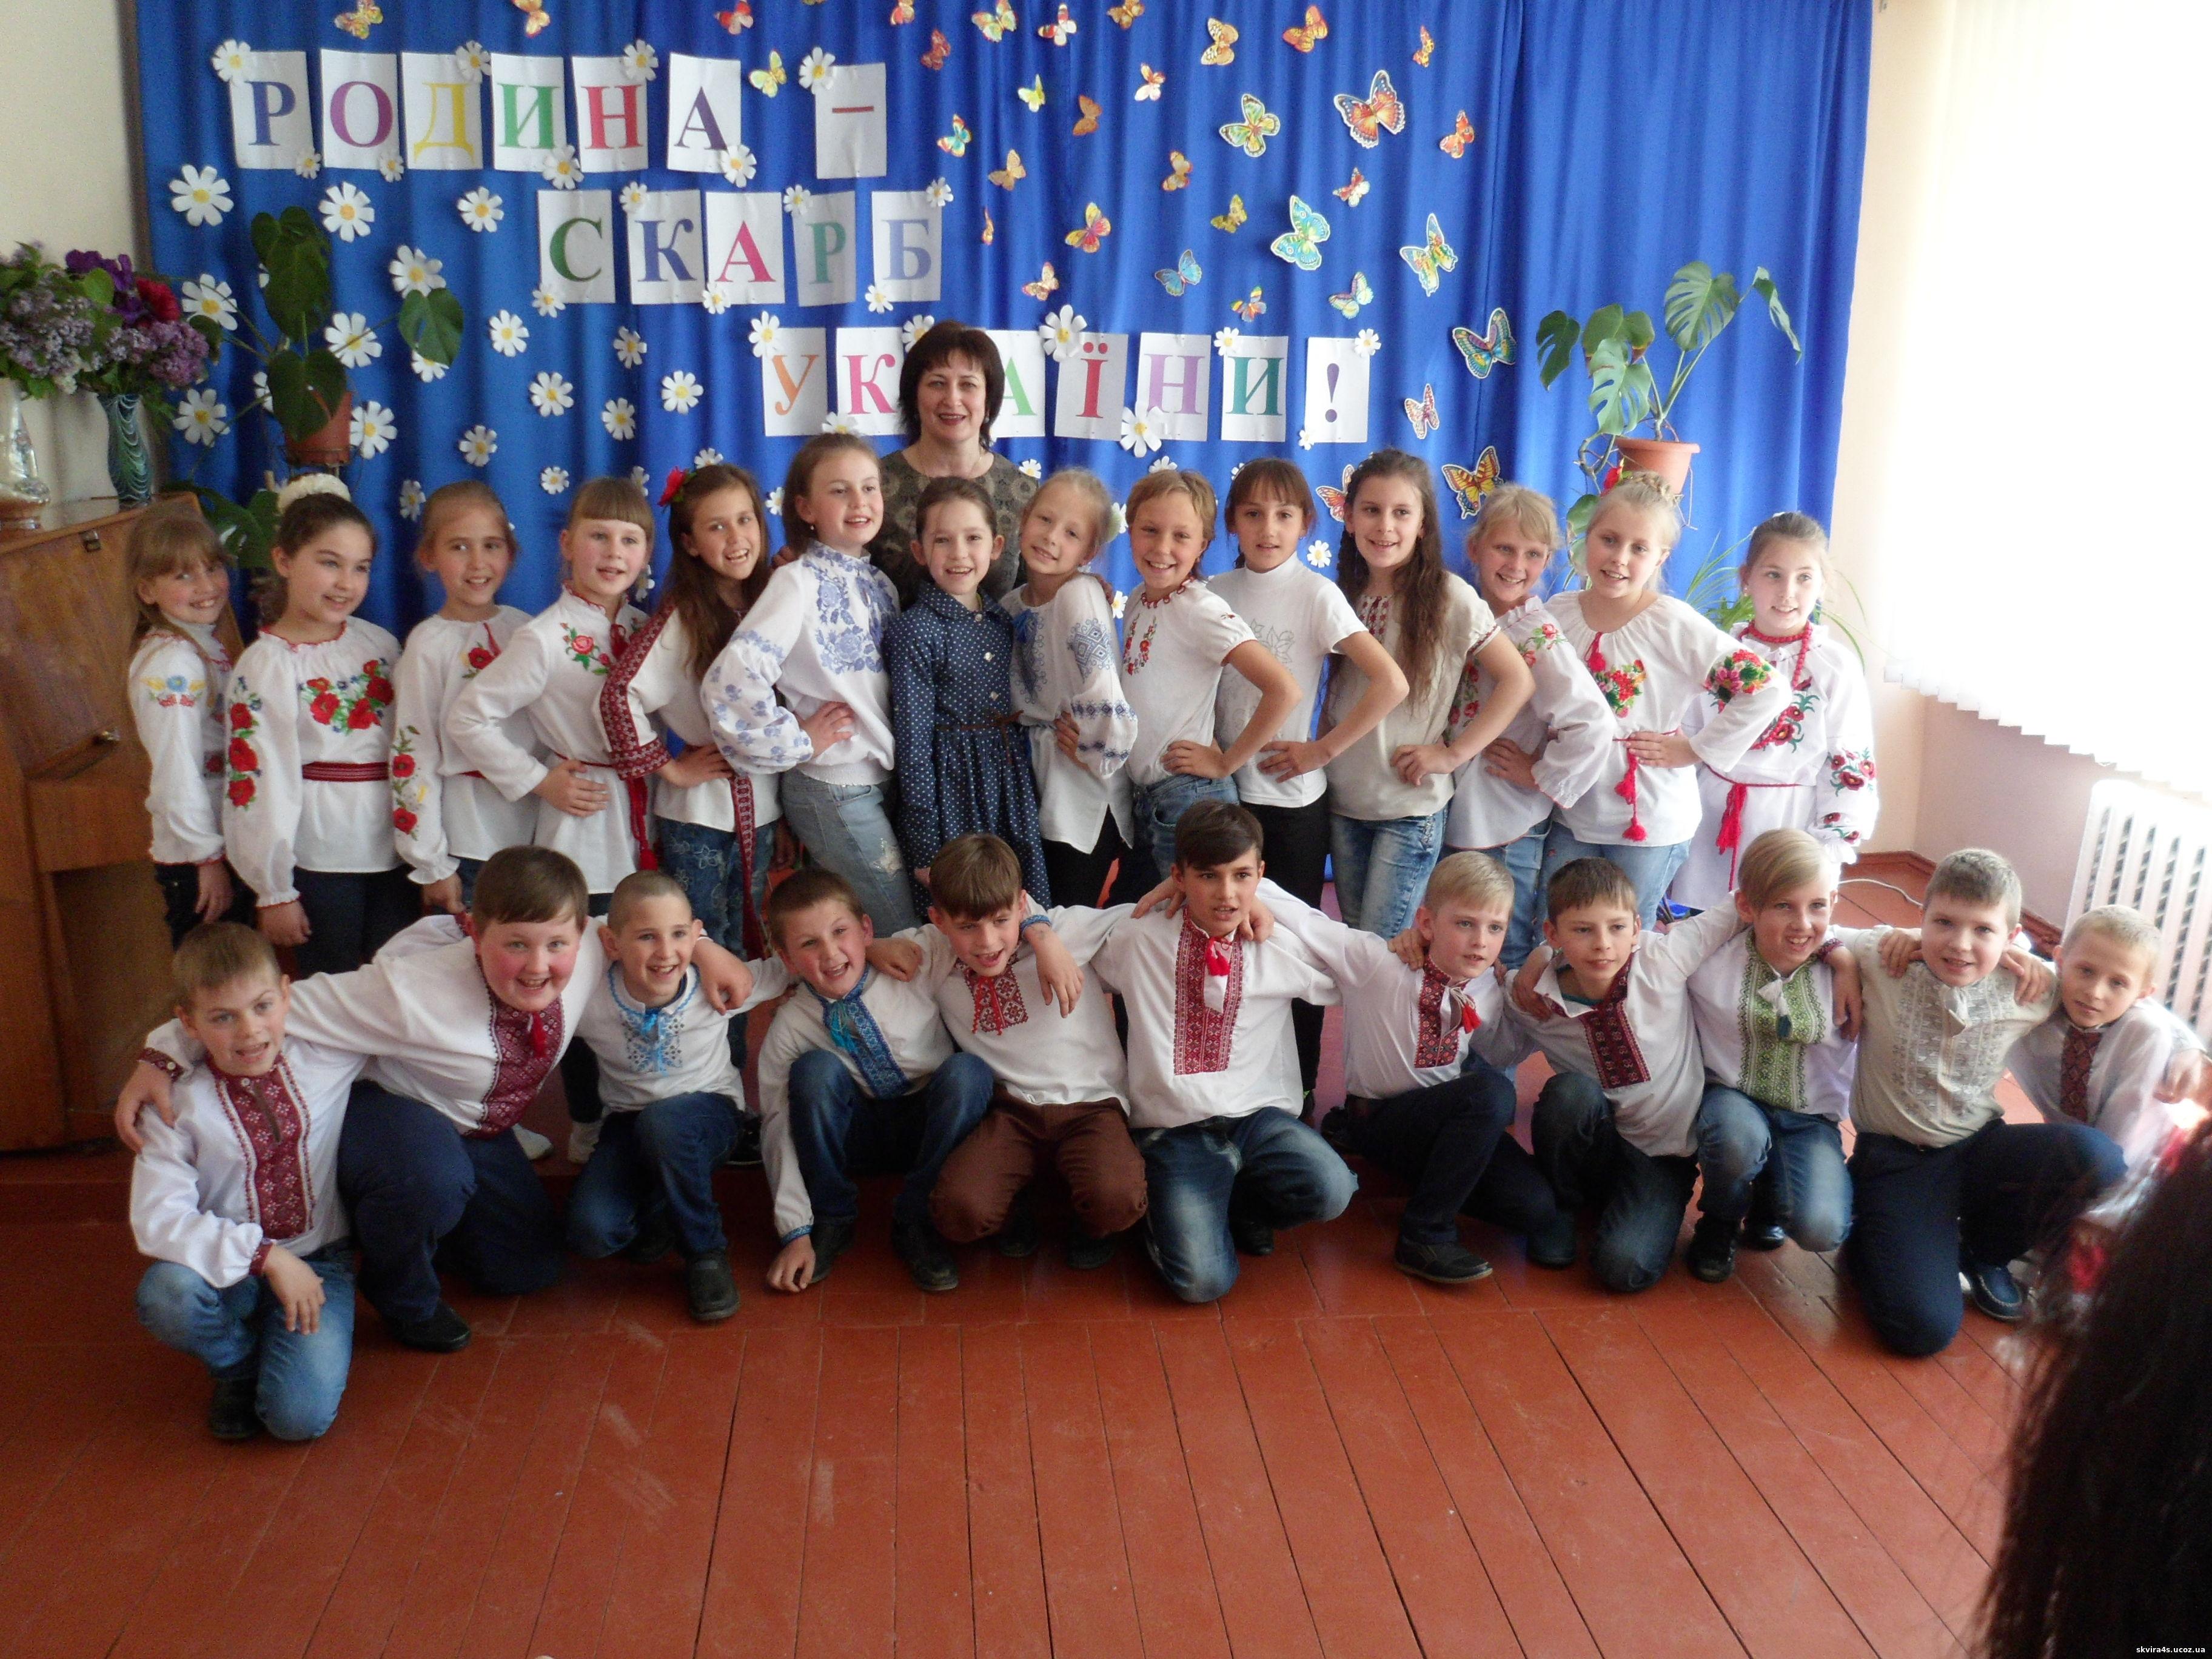 http://skvira4s.ucoz.ua/foto/15-05-17/SAM_5654.jpg